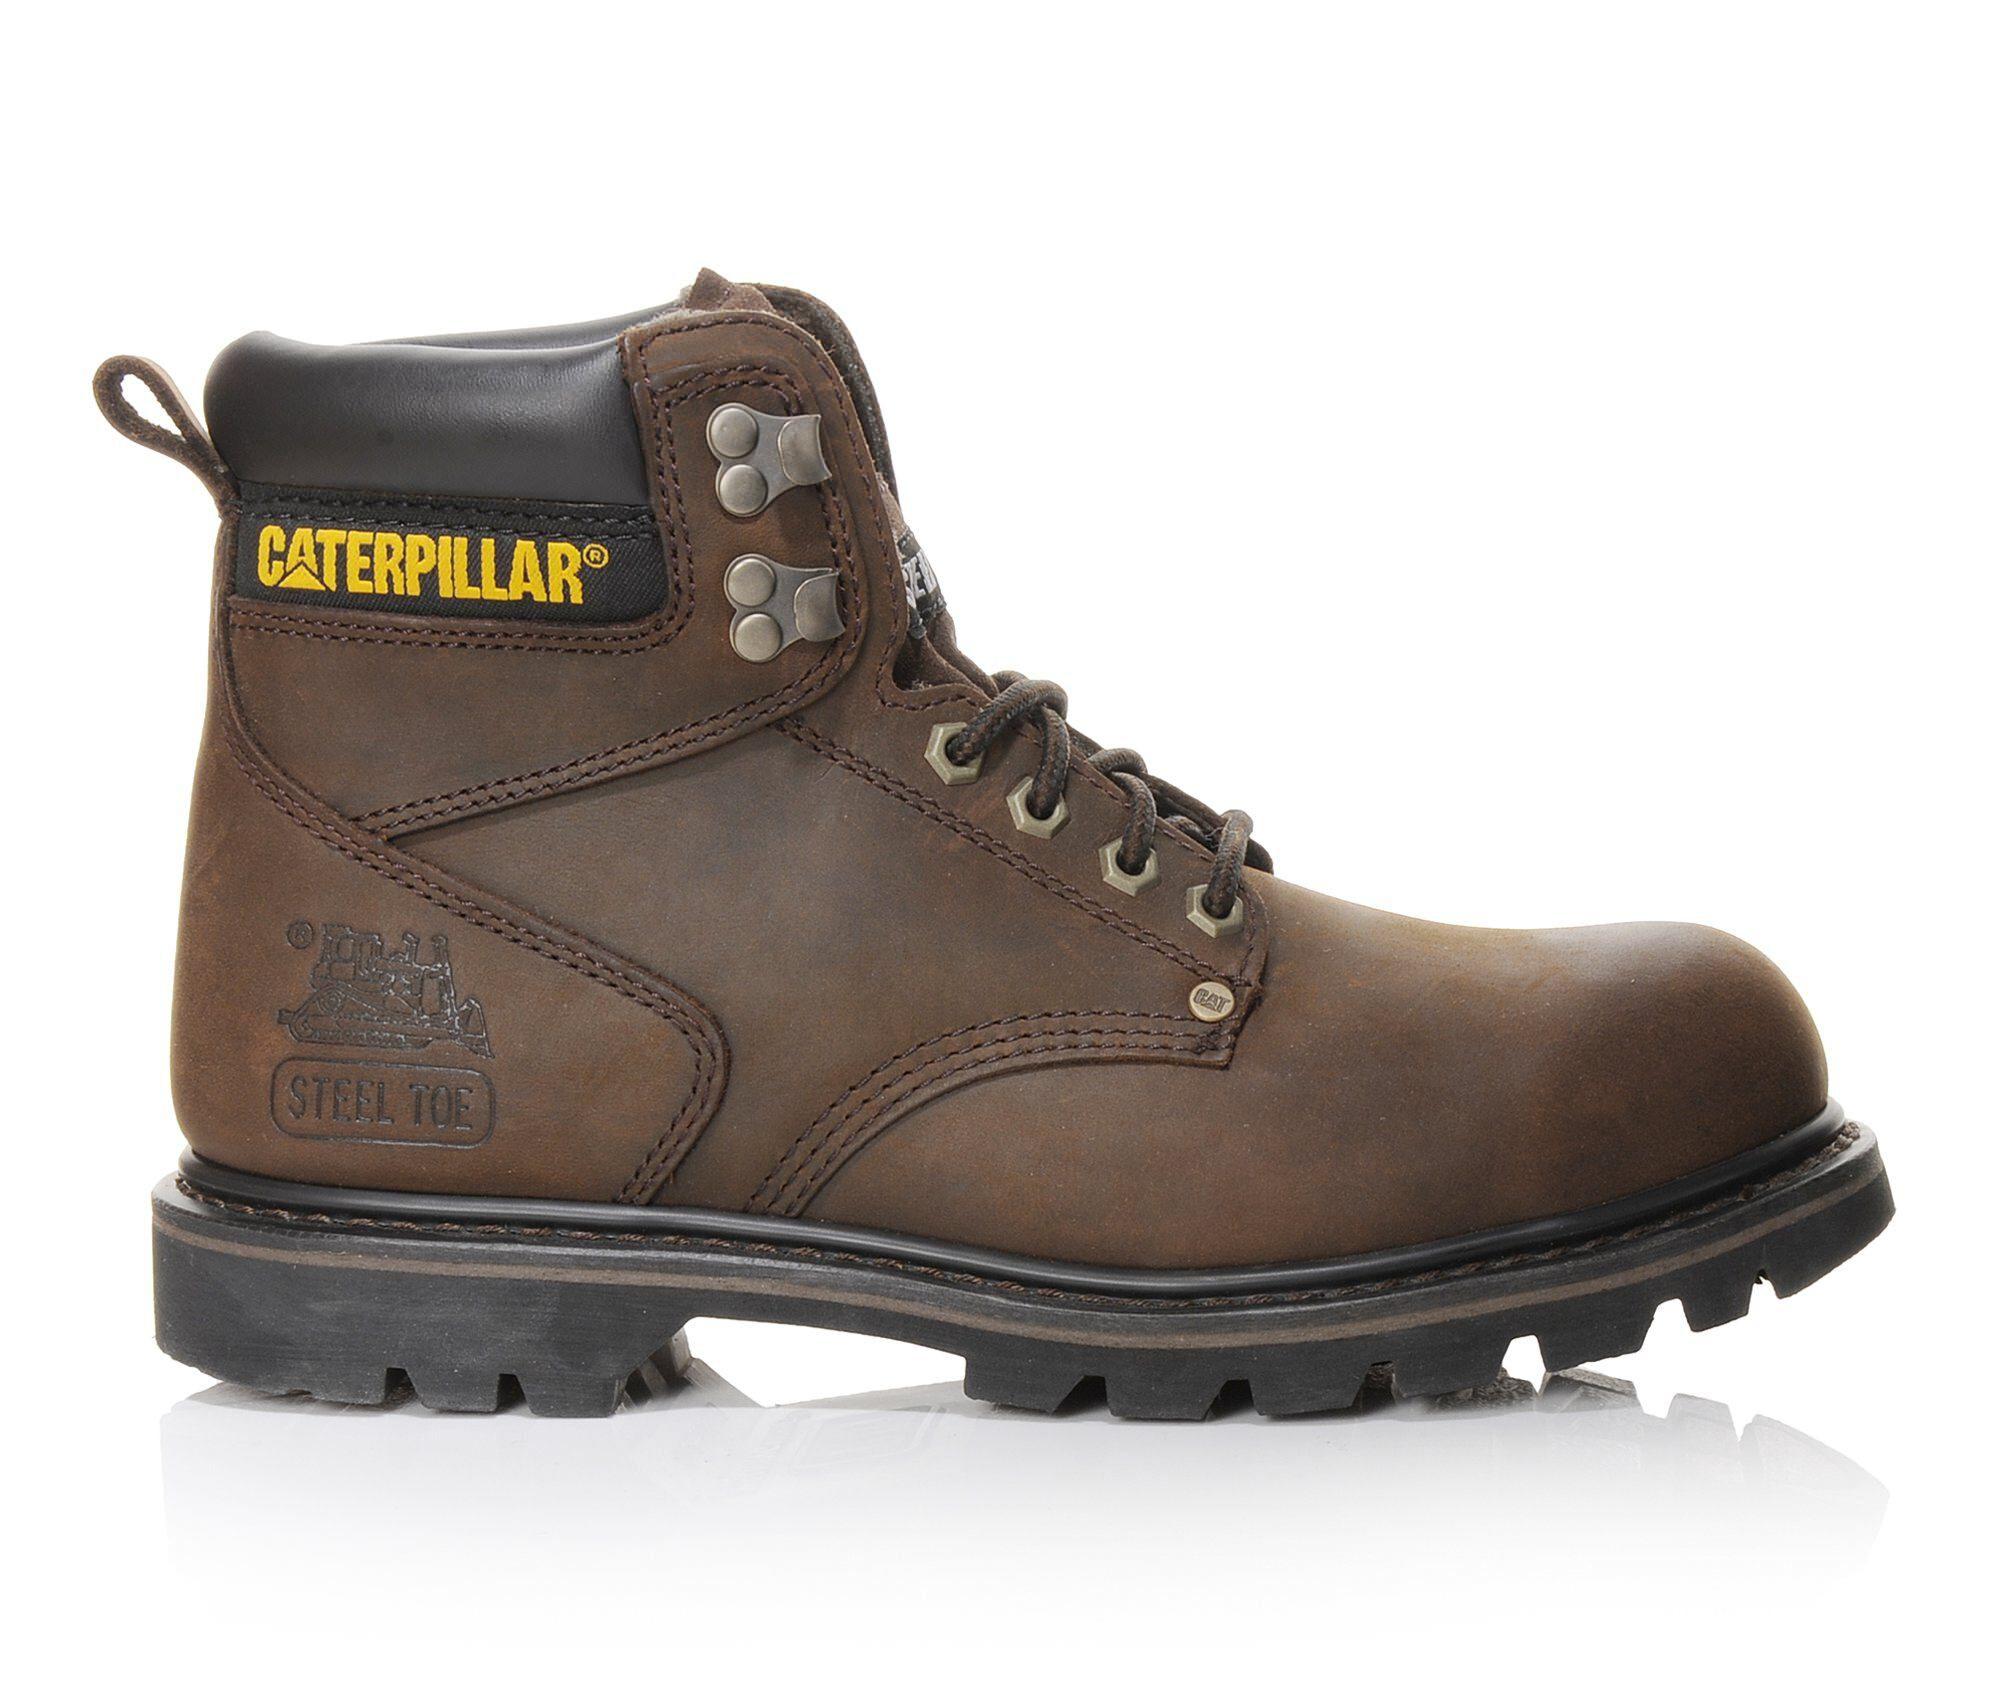 Men's Caterpillar Second Shift 6 In Steel Toe Work Boots Brown